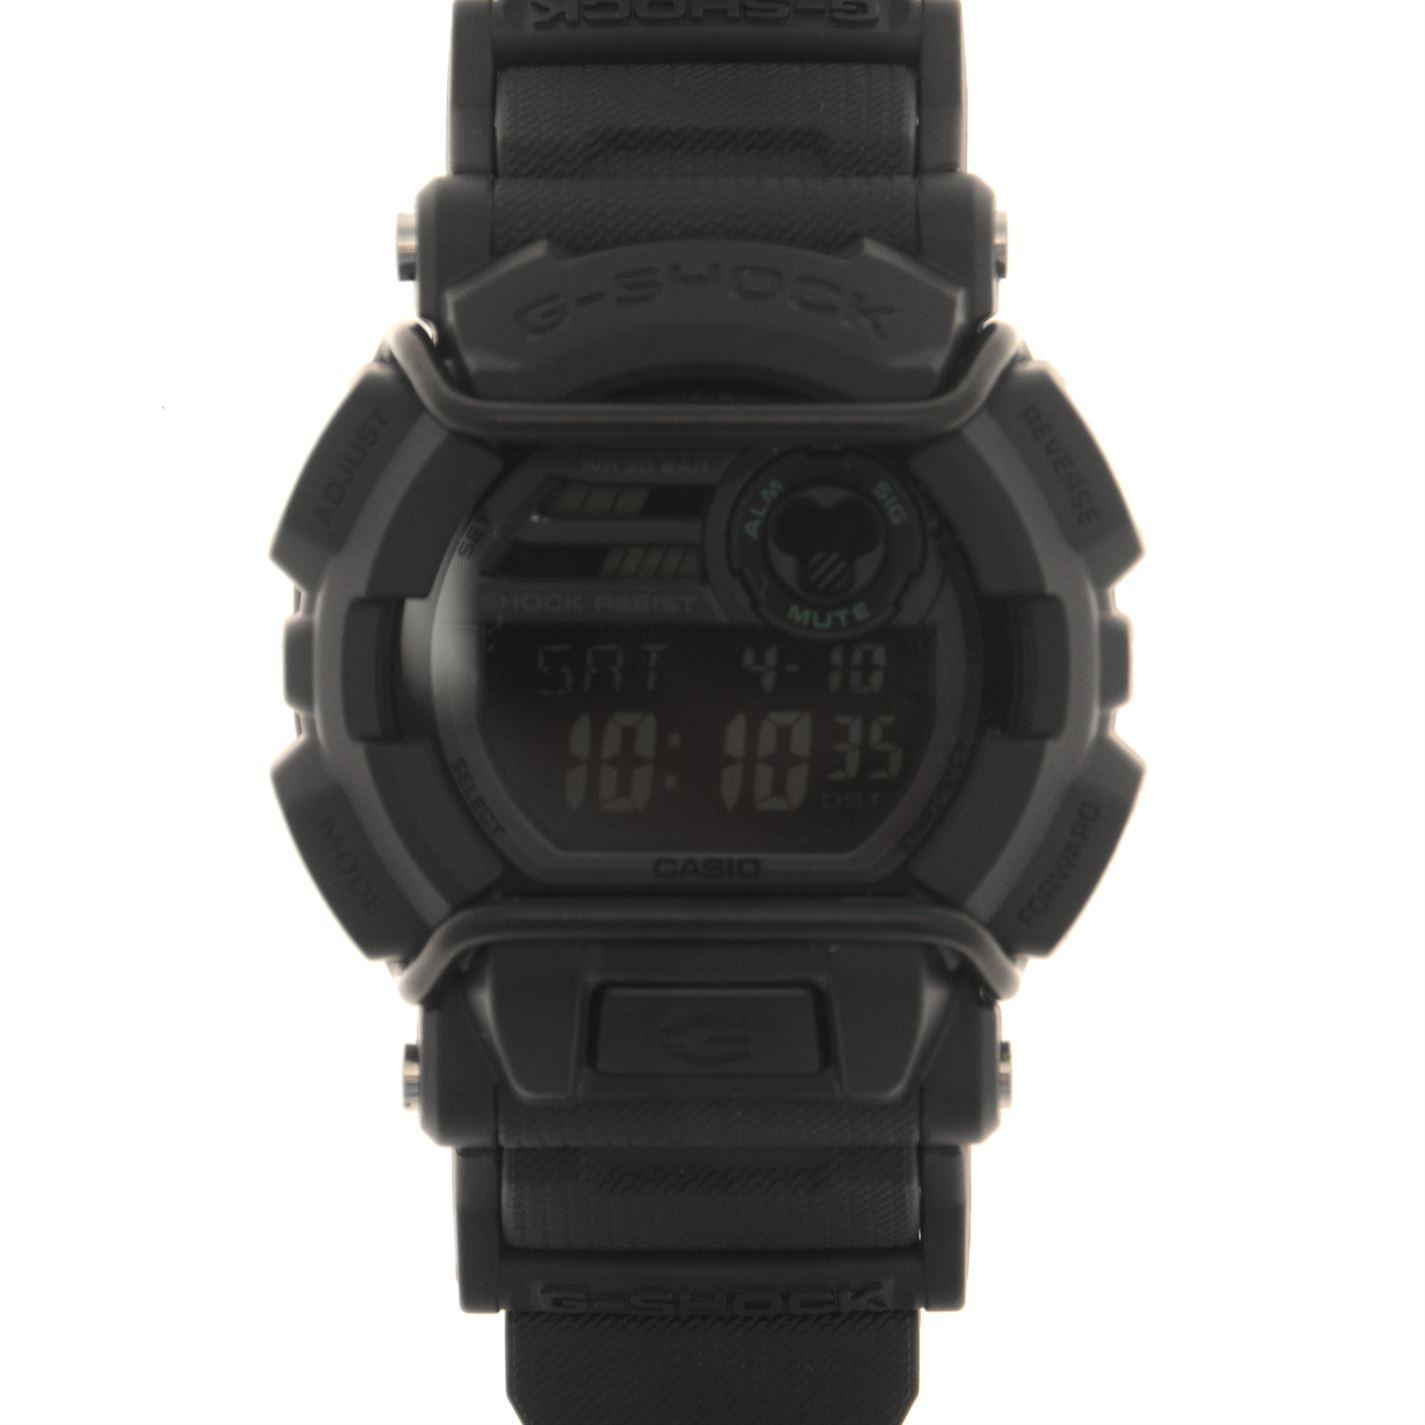 Casio Mens G Shock Alarm Chronograph Watch